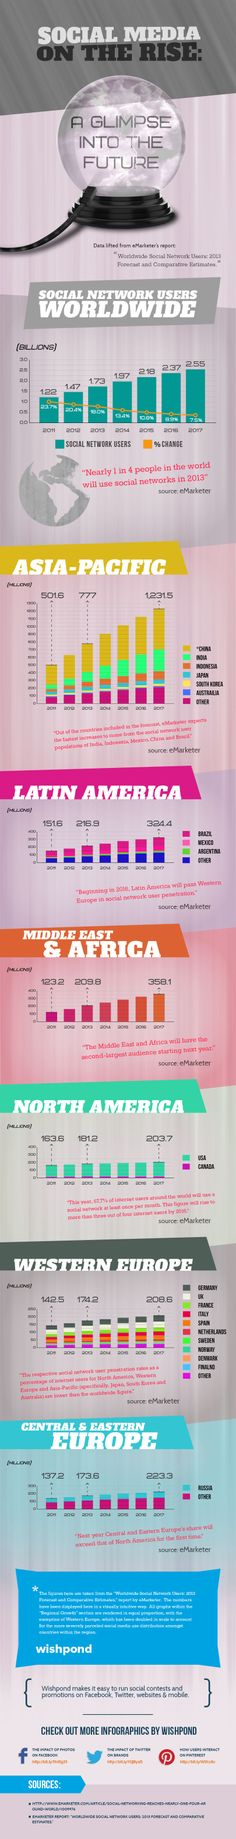 Social Media On The Rise: A Glimpse Into The Future  #Infographic #Business #SocialMedia